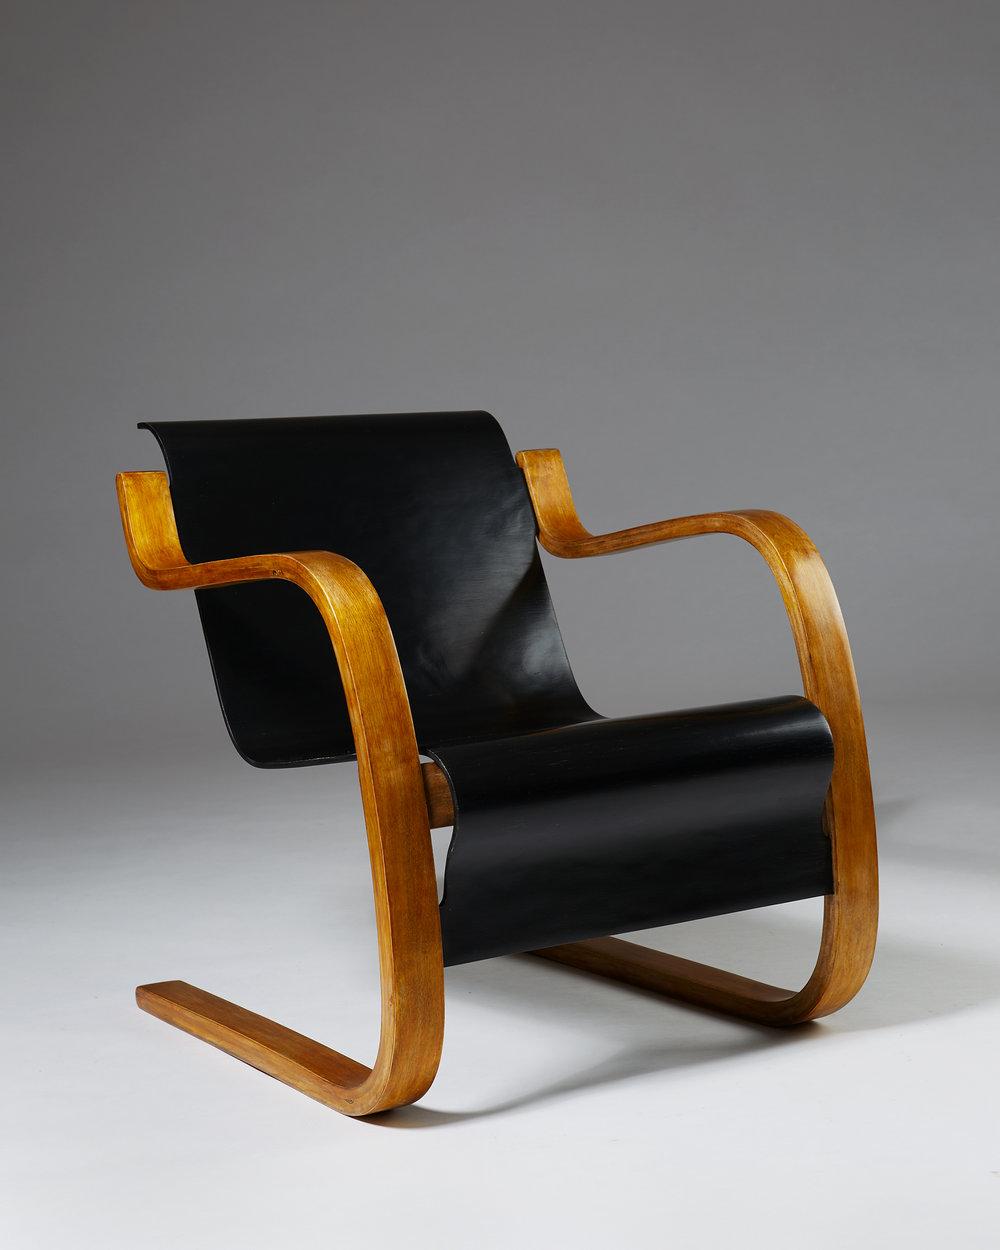 Alvar Aalto  Armchair 'Little Paimio' model number 42 Finland, 1930's Laminated birch. 69,5 x 61,5 x 73 cm Seat: 38 cm